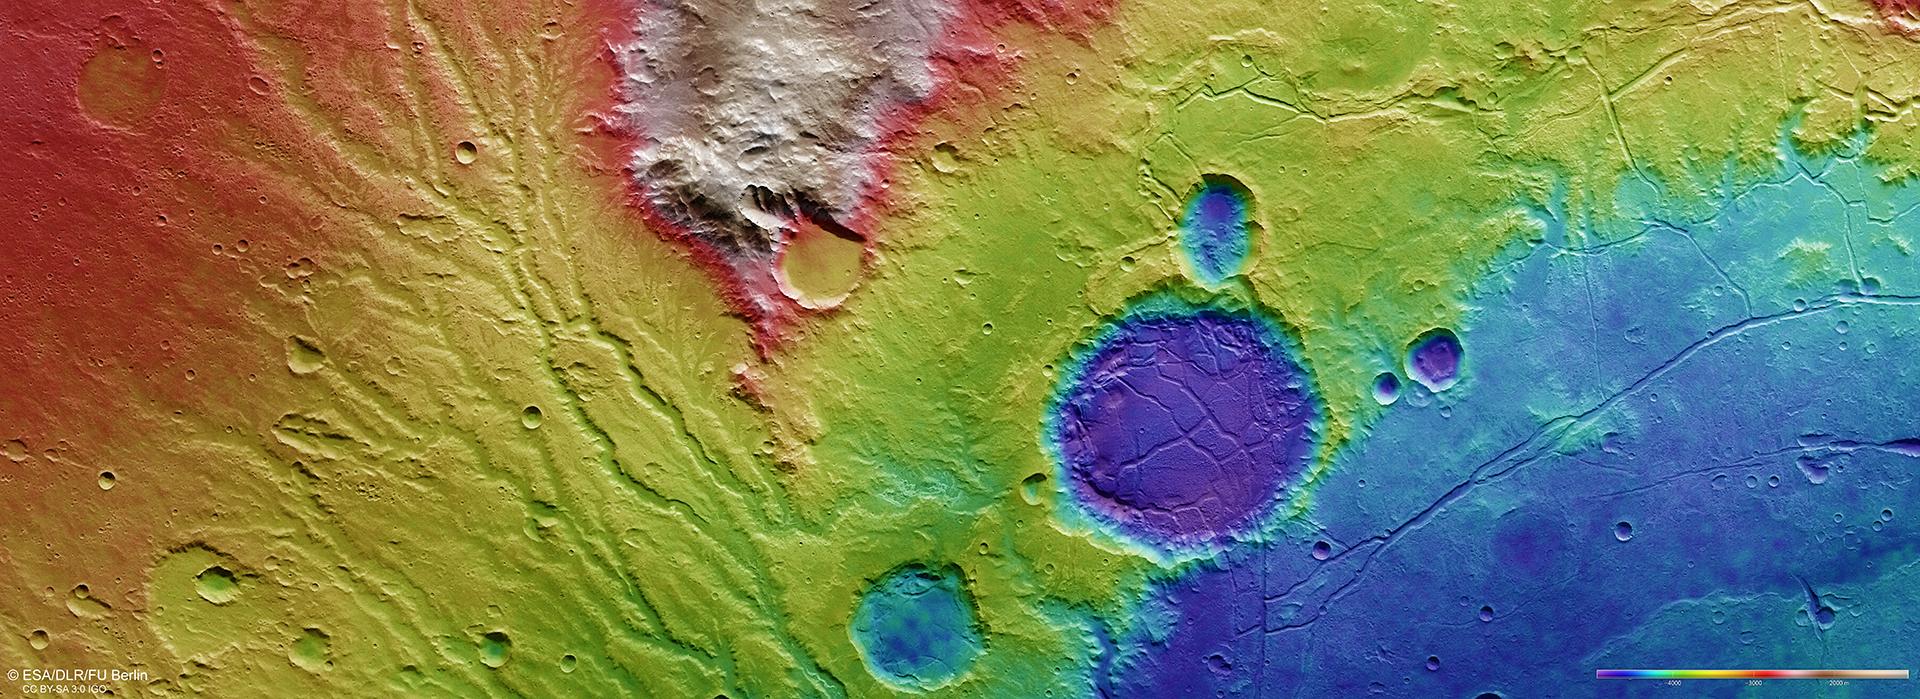 Arda_Valles_topography